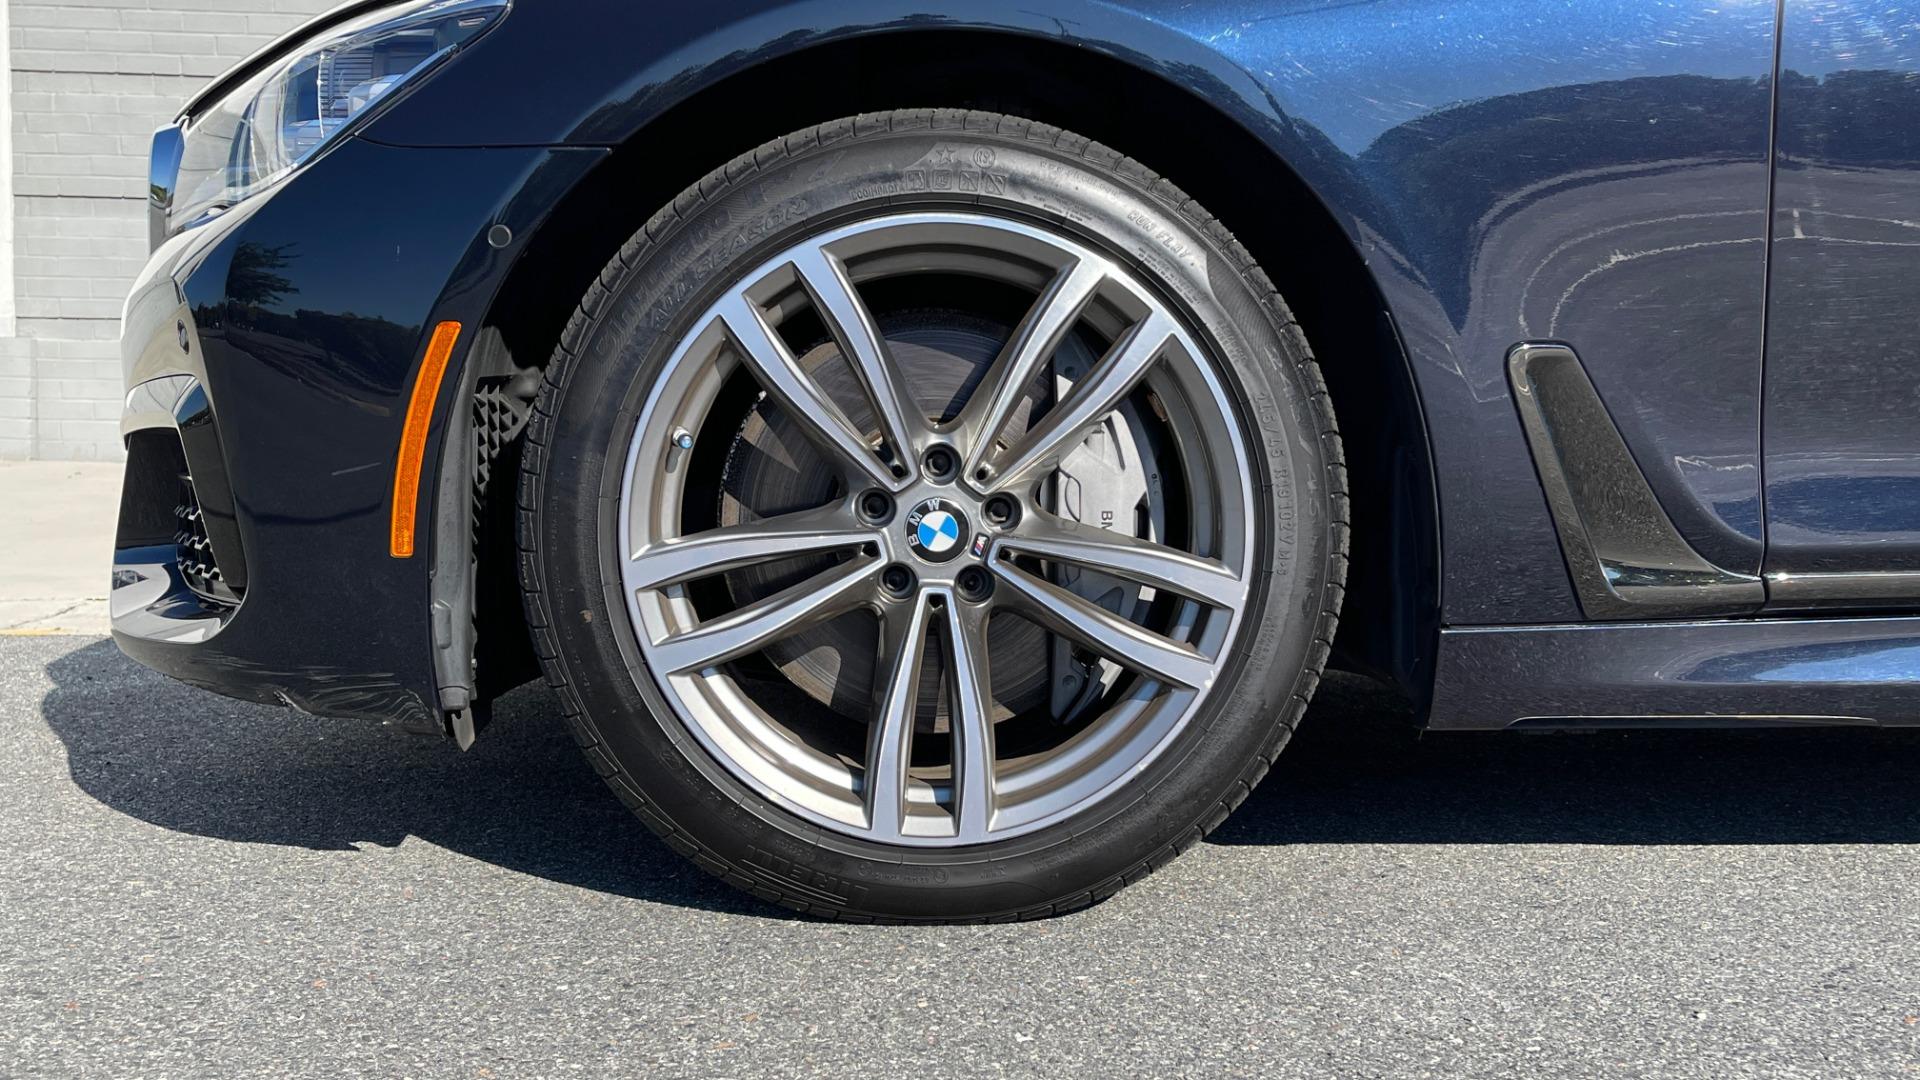 Used 2019 BMW 7 SERIES 750I XDRIVE M-SPORT / EXEC PKG / DRVR ASST PLUS / CLD WTHR / PAR for sale $60,995 at Formula Imports in Charlotte NC 28227 57